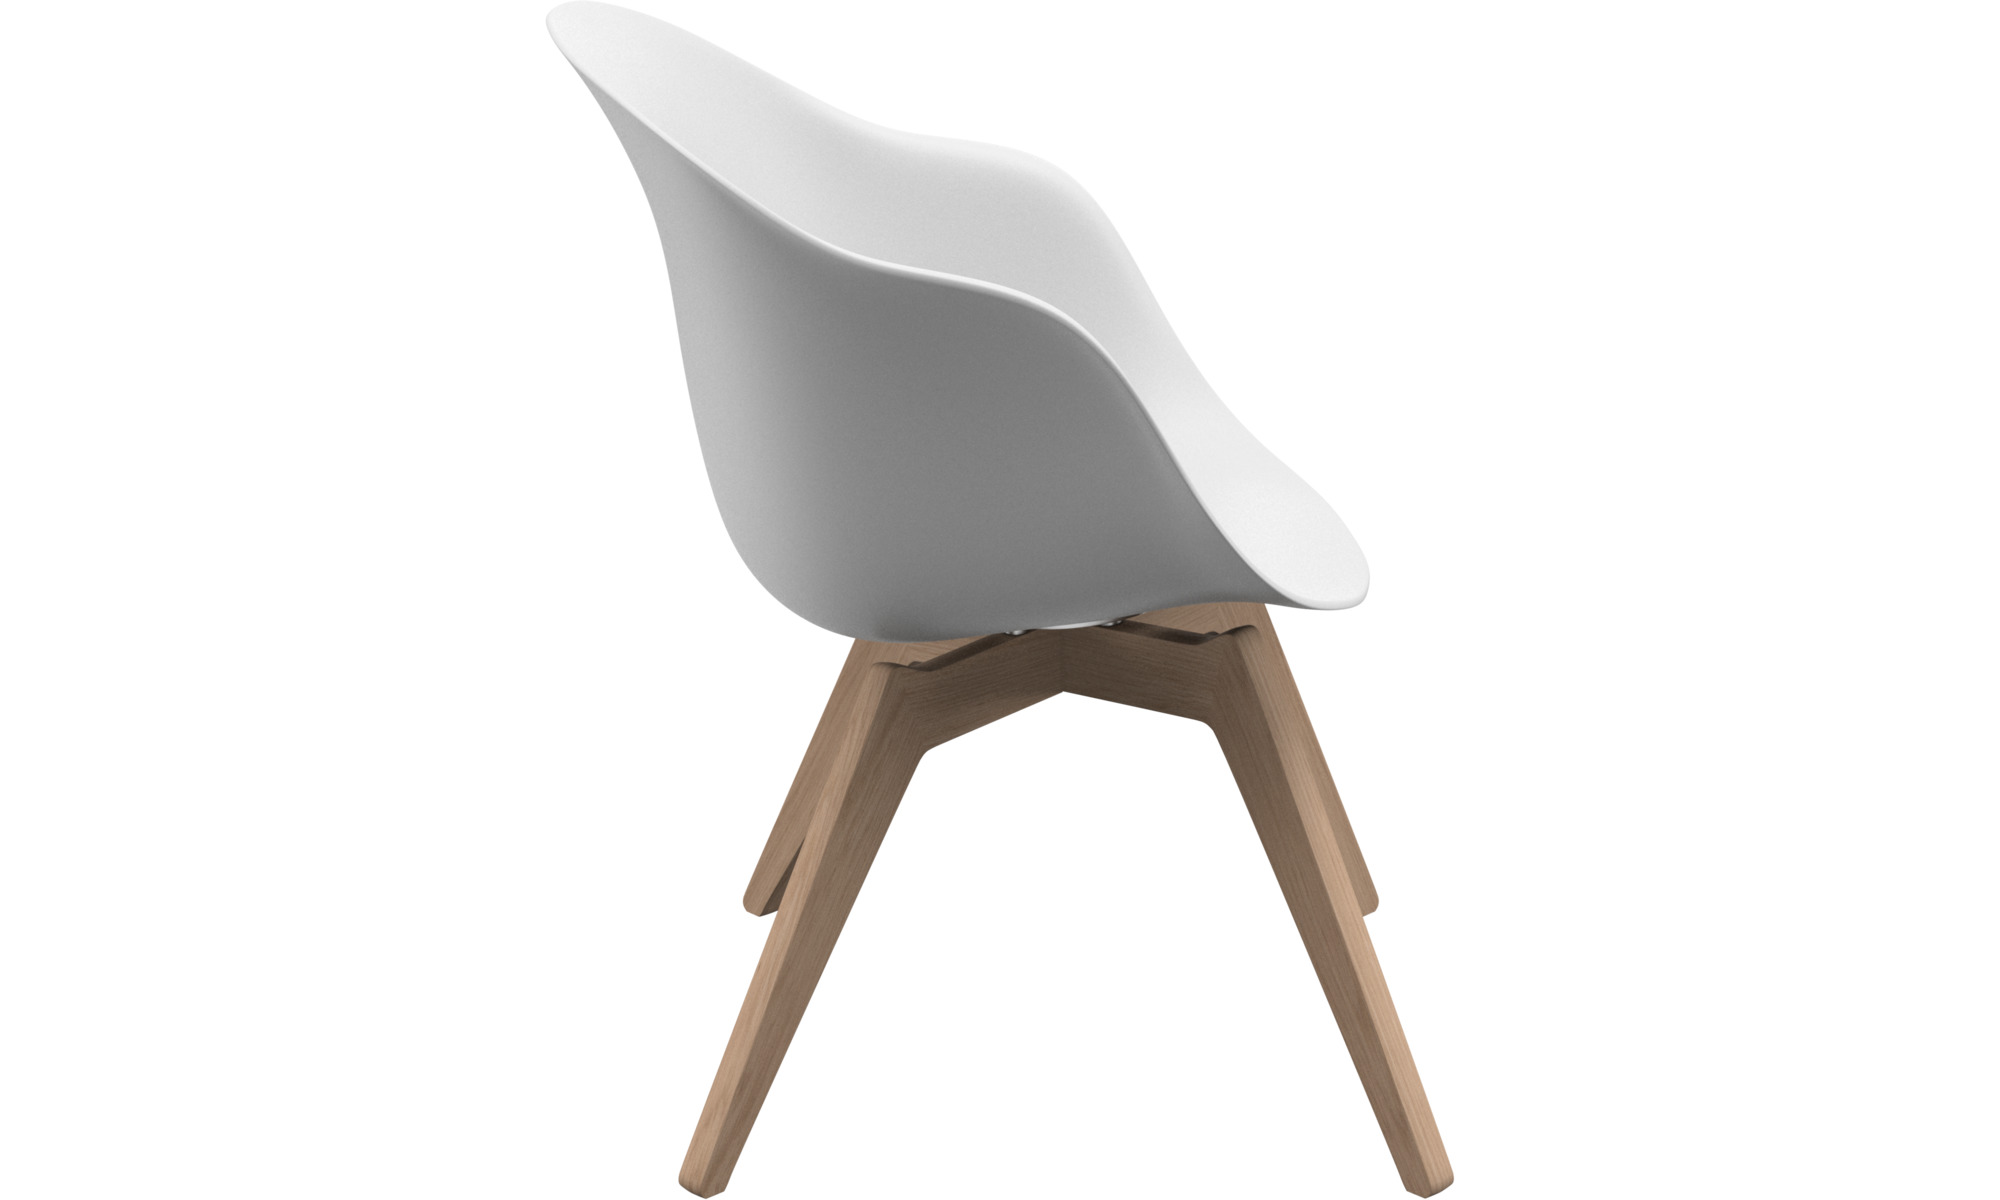 Strange Armchairs Adelaide Lounge Chair Boconcept Machost Co Dining Chair Design Ideas Machostcouk